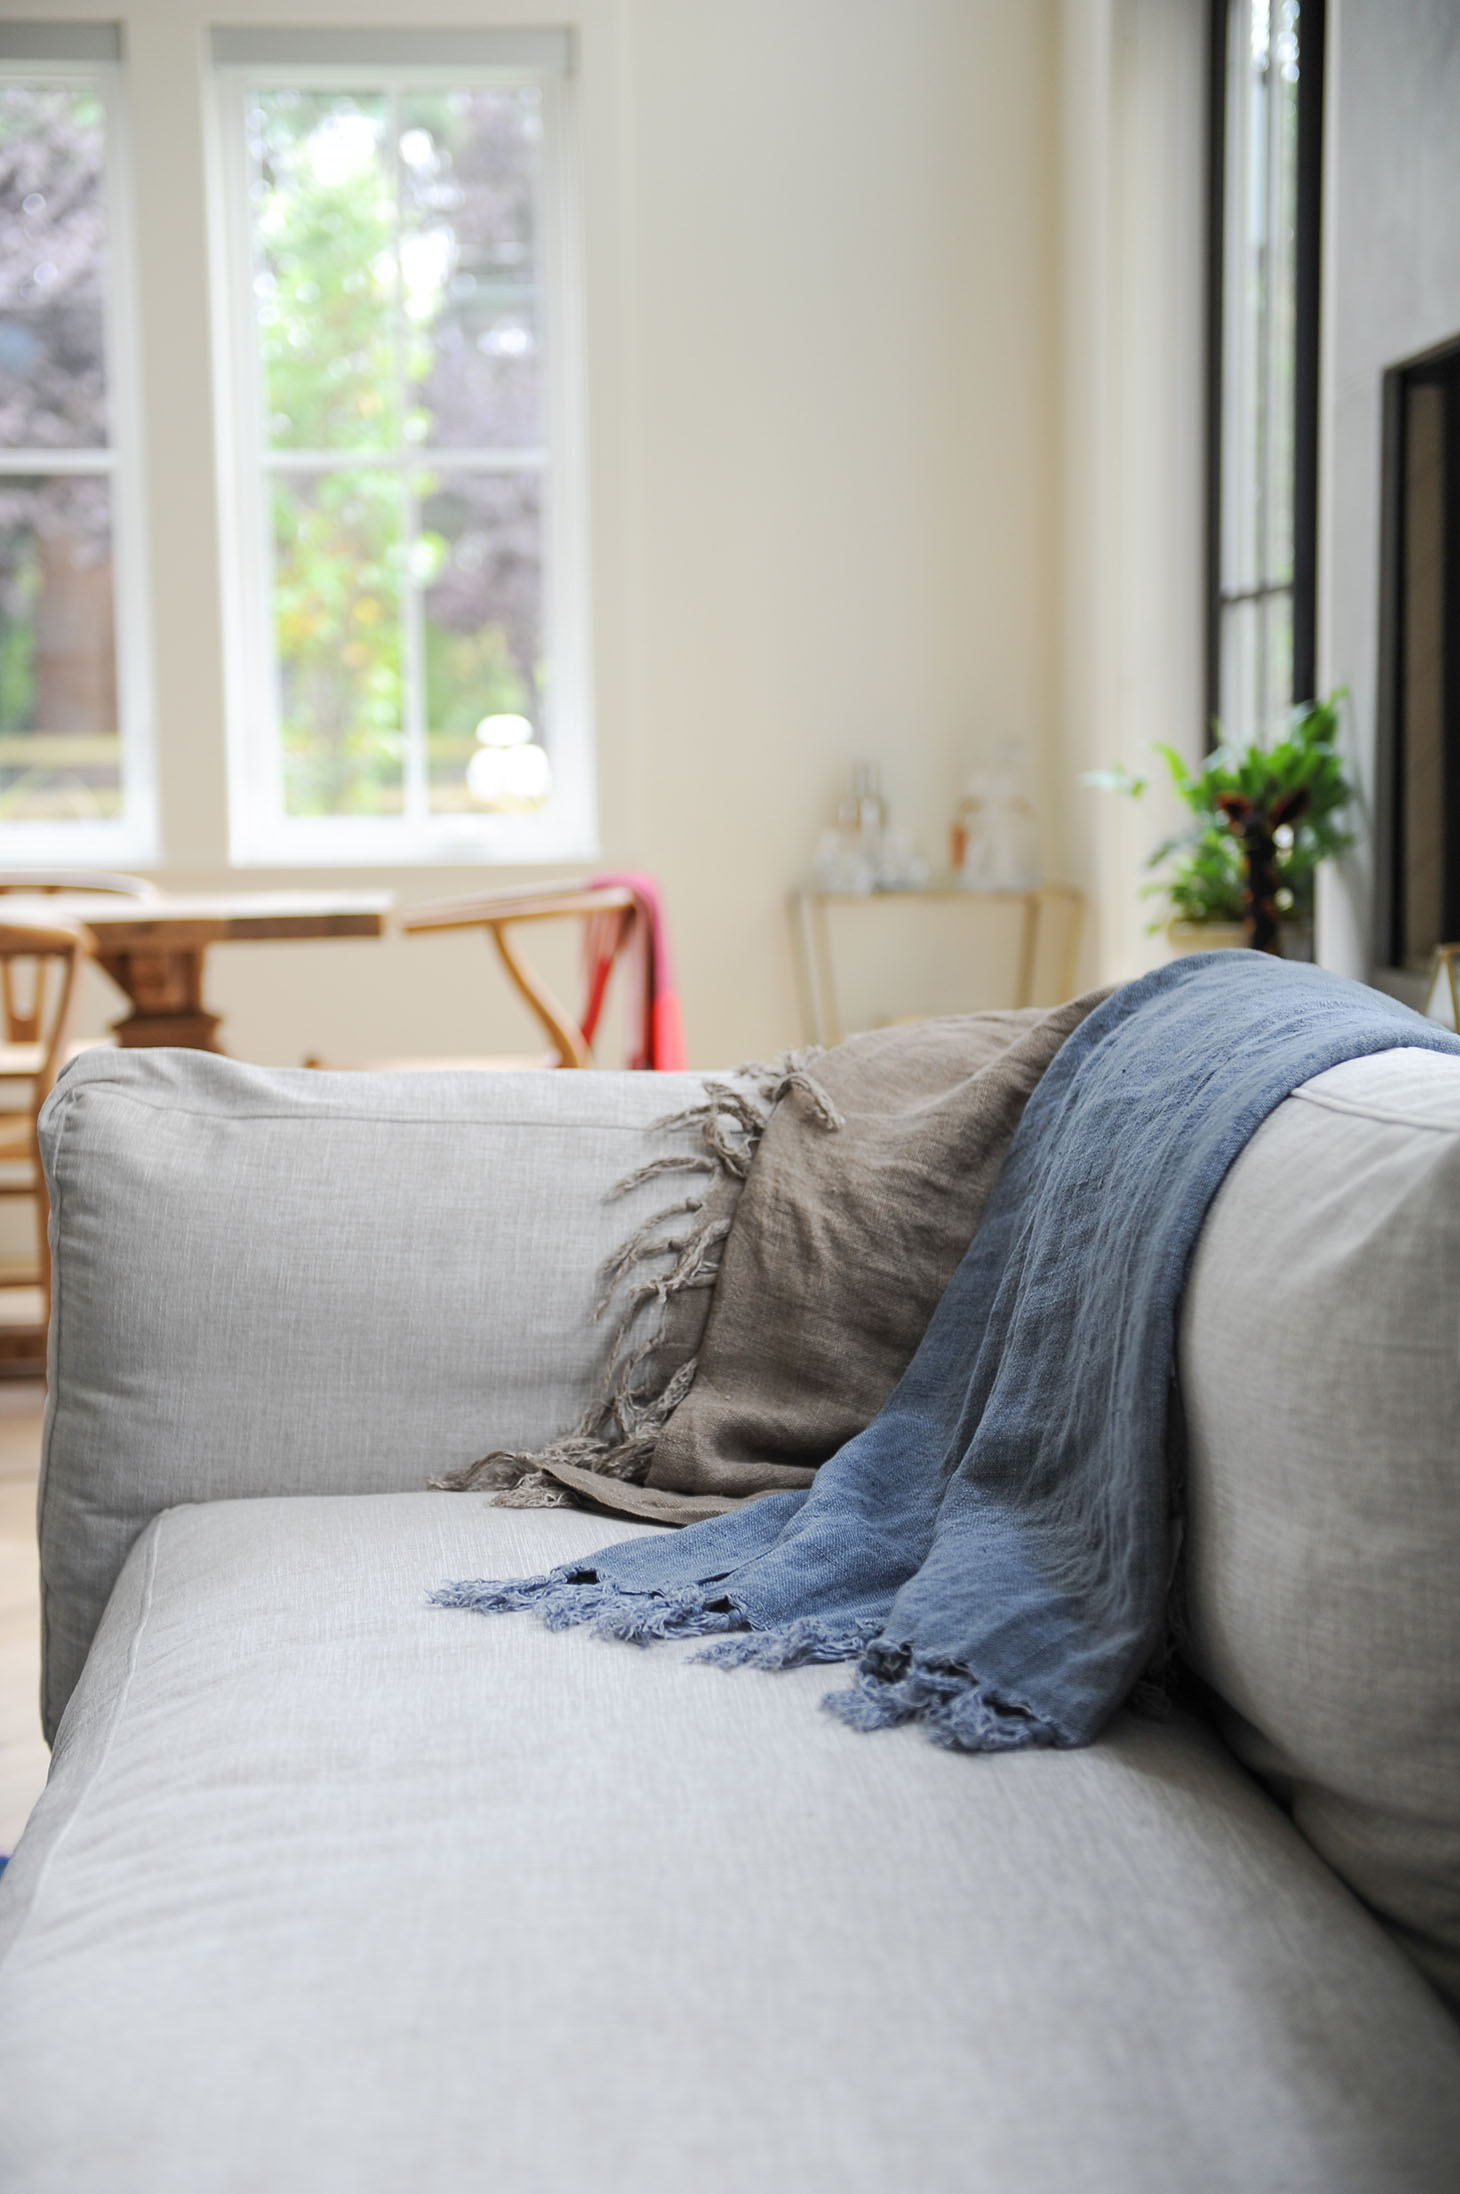 Jillian-Harris-Update-on-Kenny-and-Michelle-Gemmills-Home-Renovation-4.jpg